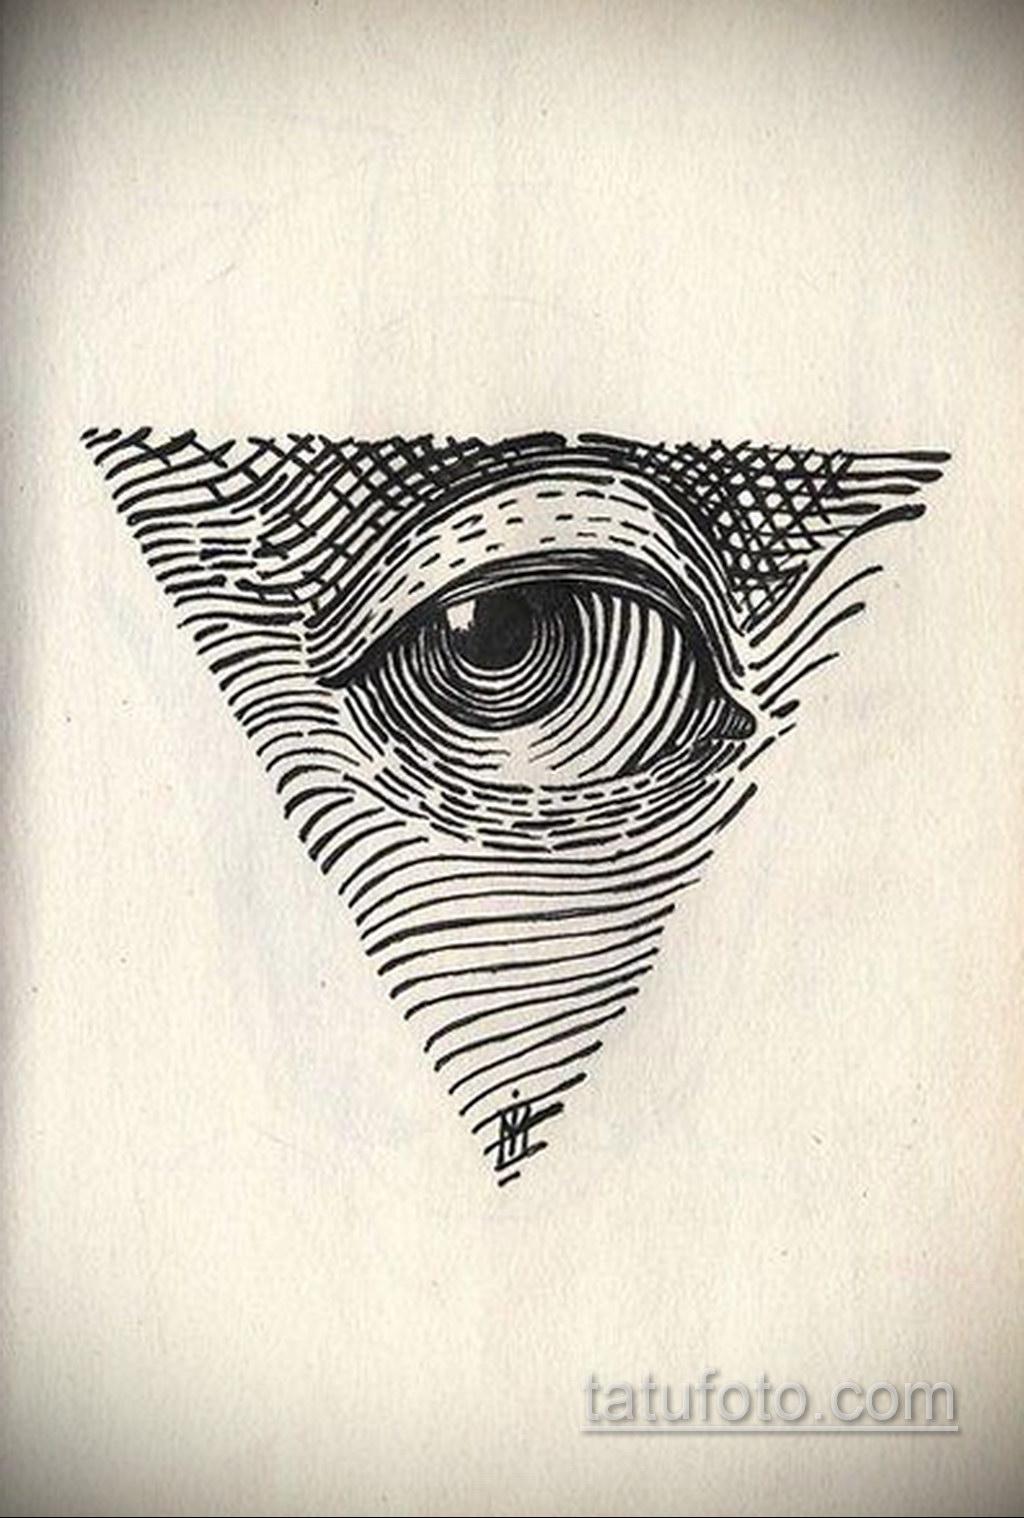 Фото рисунка тату с треугольником 22.11.2020 №005 -triangle tattoo- tatufoto.com